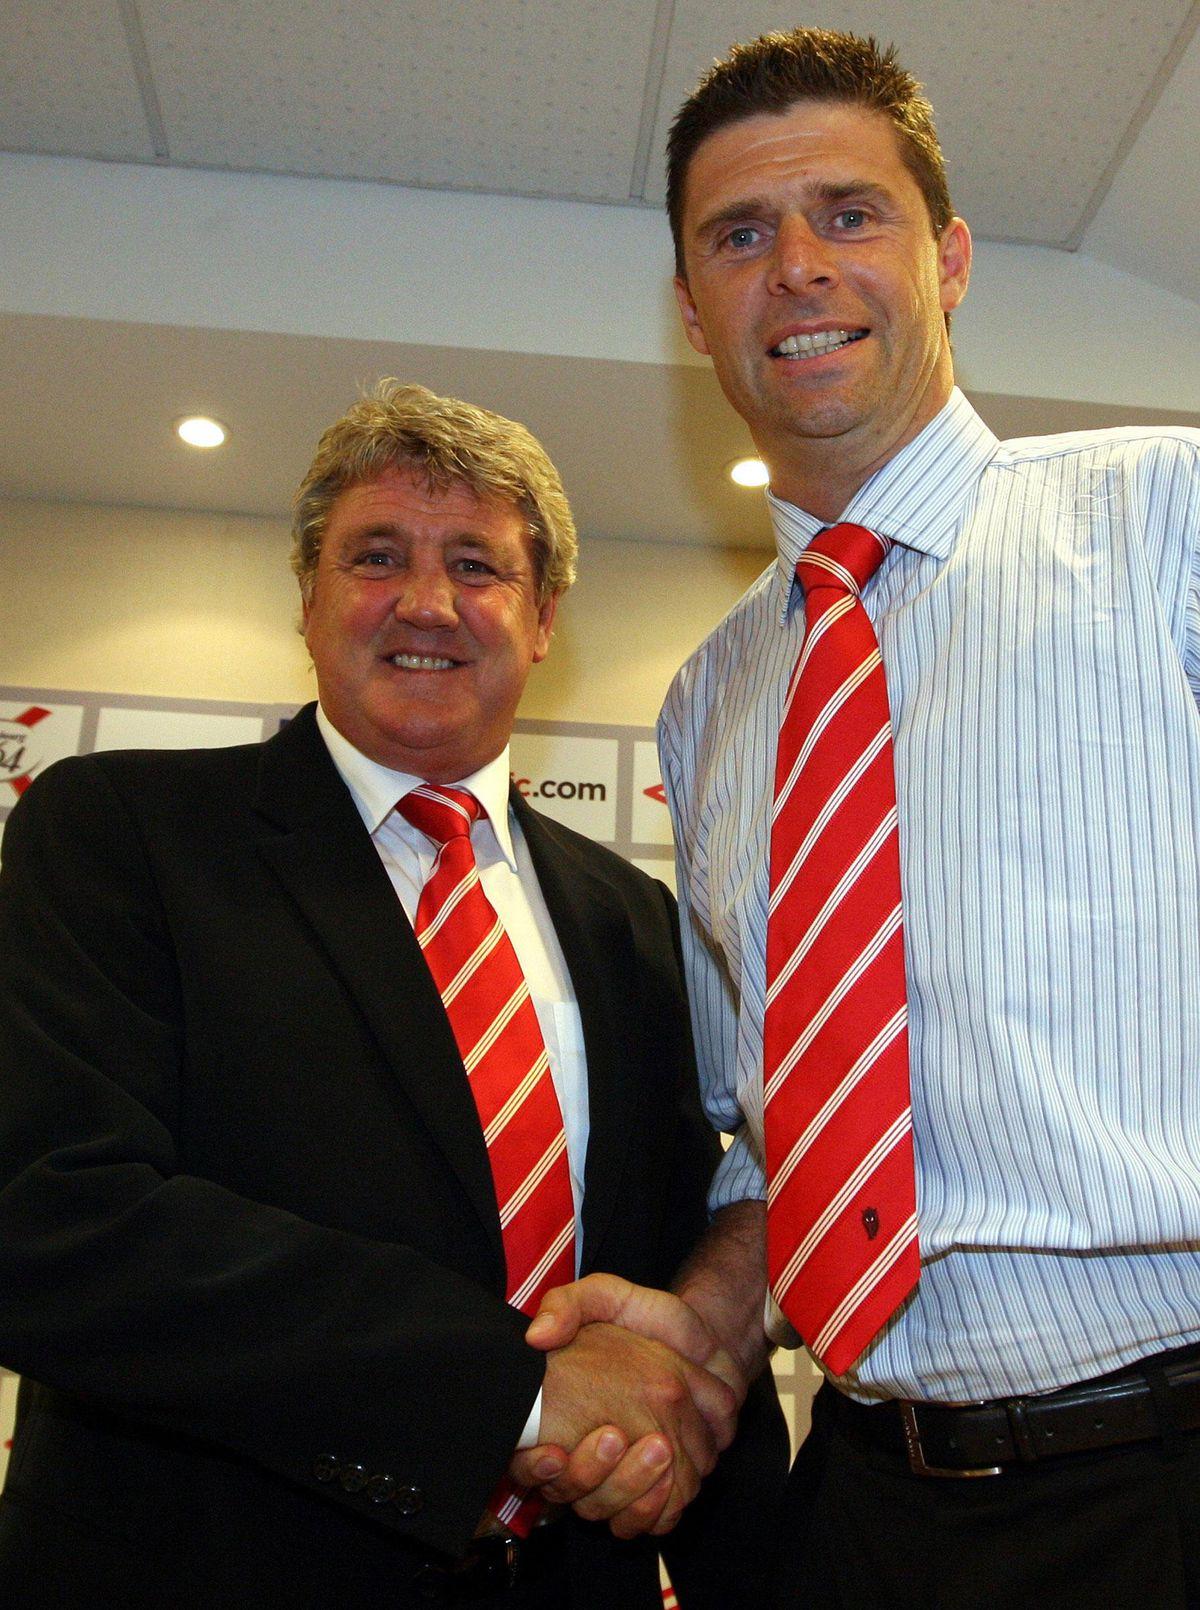 Soccer - Sunderland Press Conference - Academy of Light